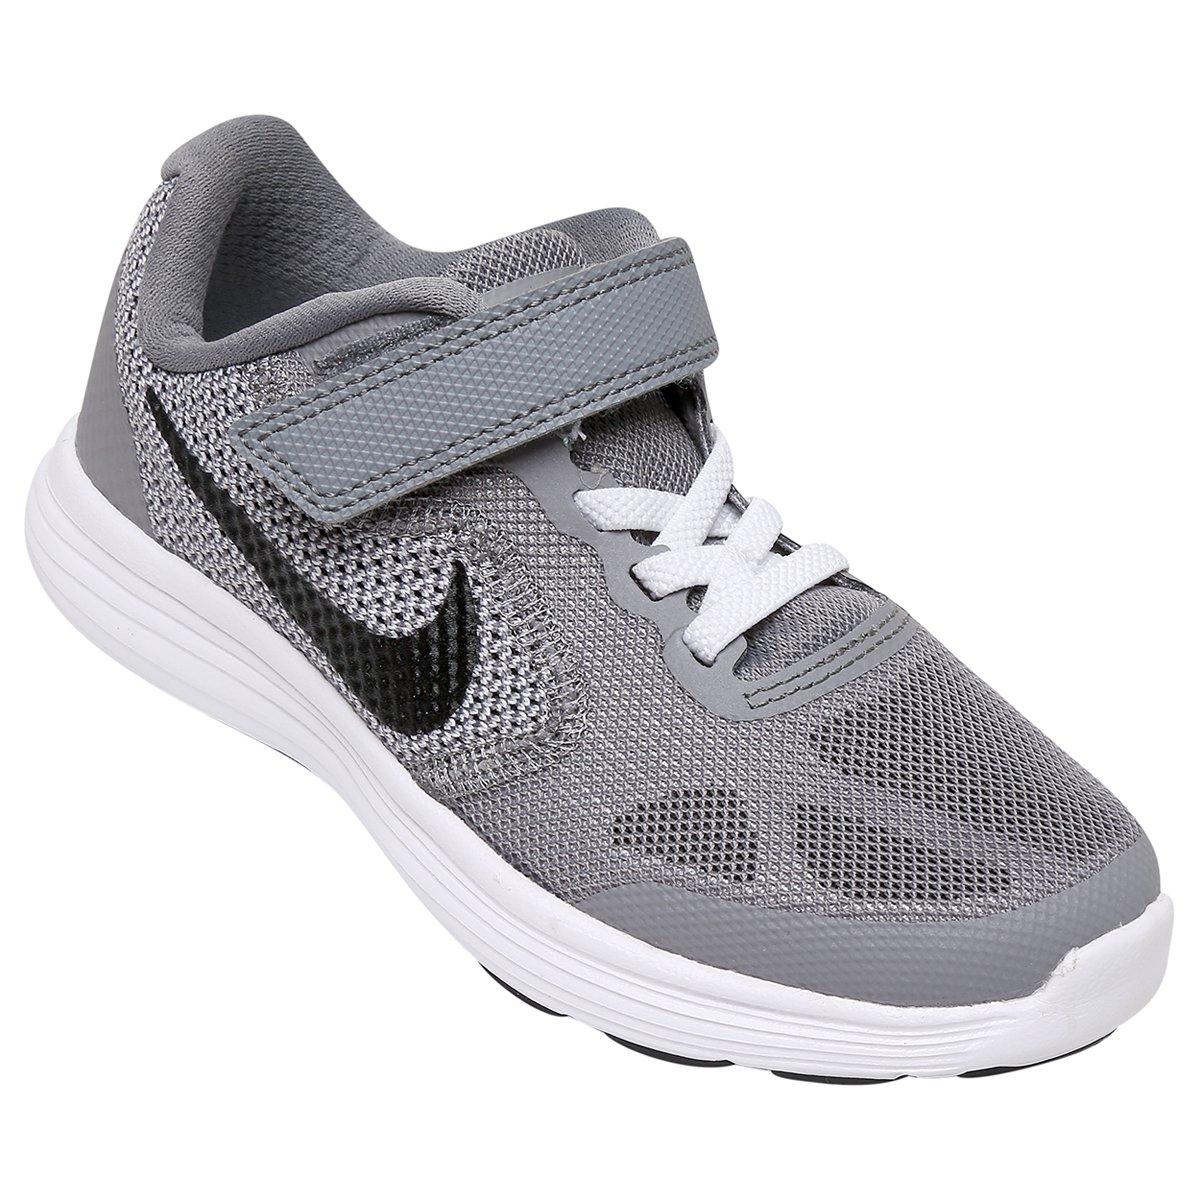 729ec53d69 Tênis Nike Revolution 3 Infantil - Compre Agora